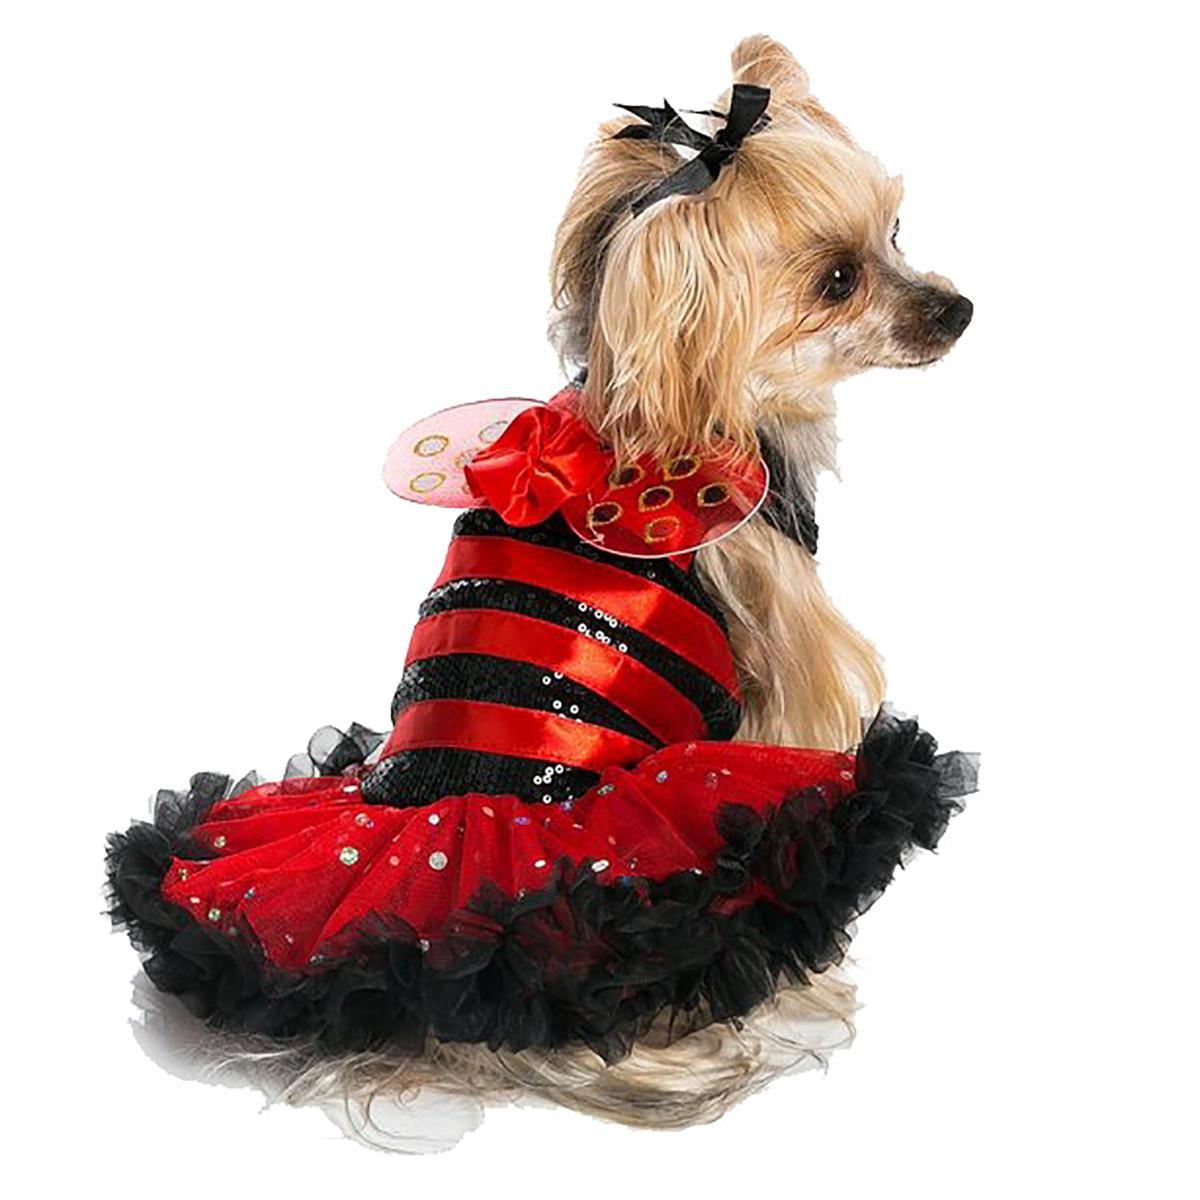 sc 1 st  BaxterBoo & Ladybug Dog Dress by Pawpatu with Same Day Shipping | BaxterBoo